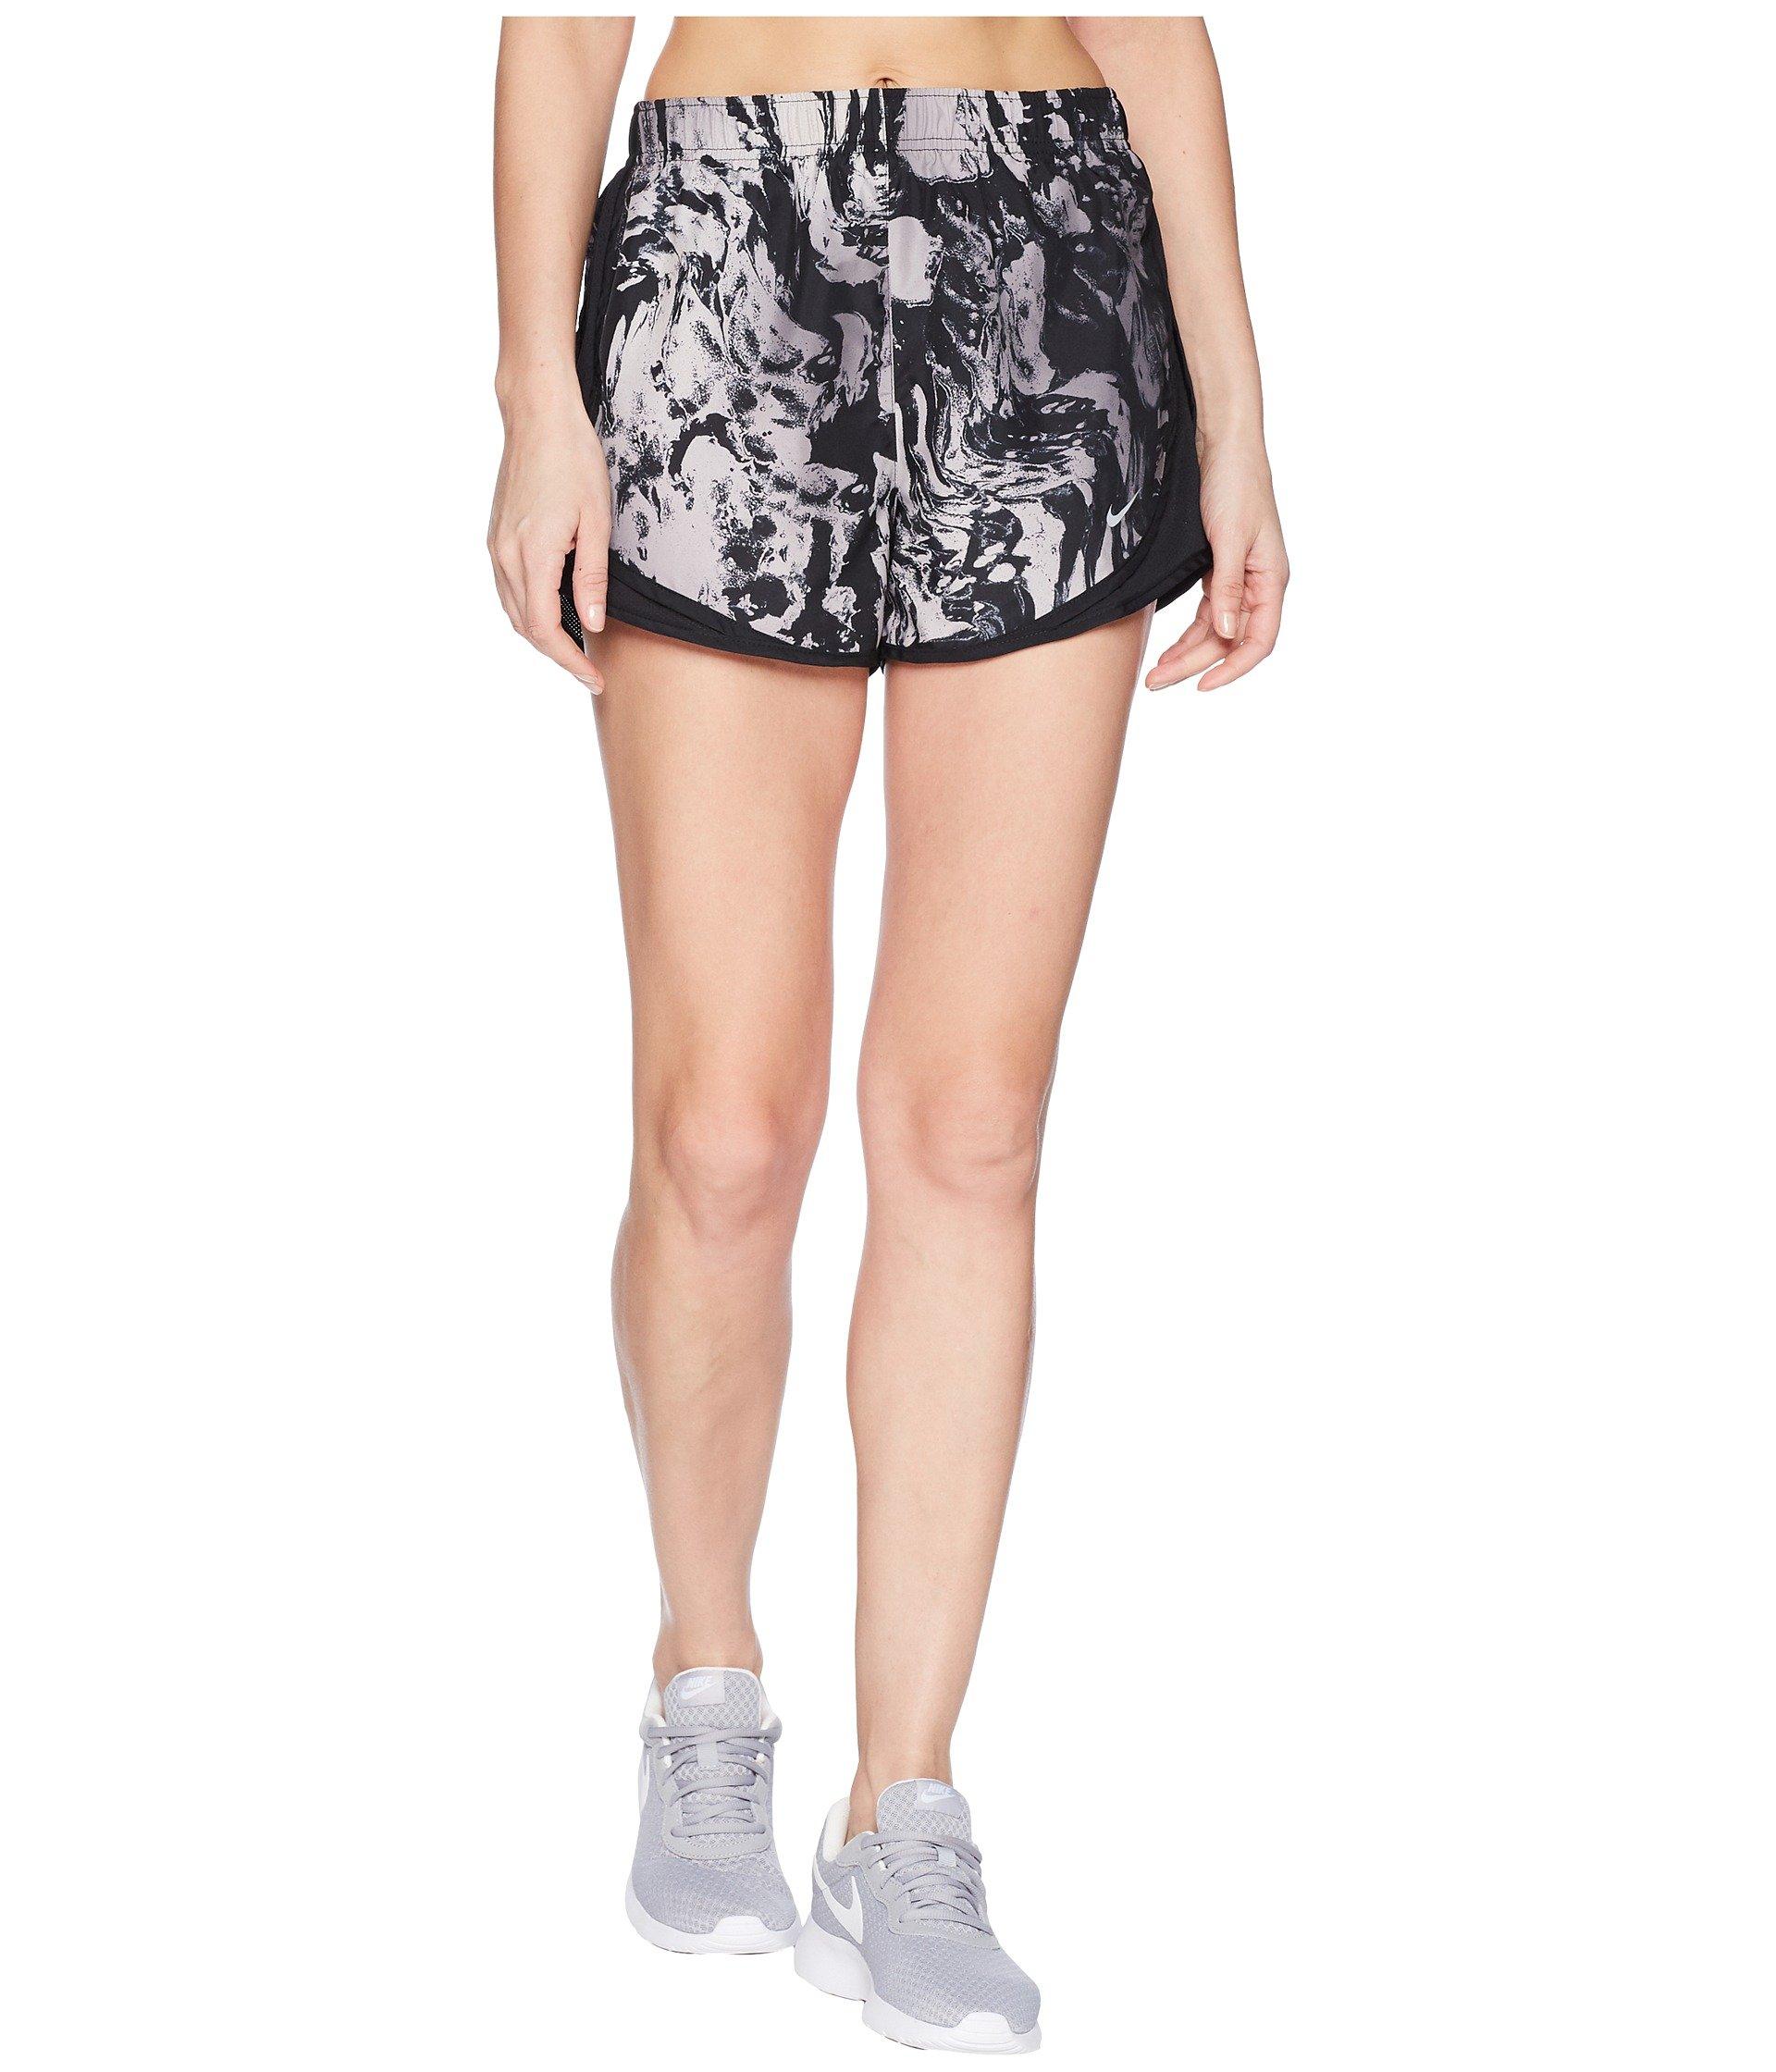 Nike Women's Dry Tempo Print Shorts Black/Black/Black/Wolf Grey X-Small 3